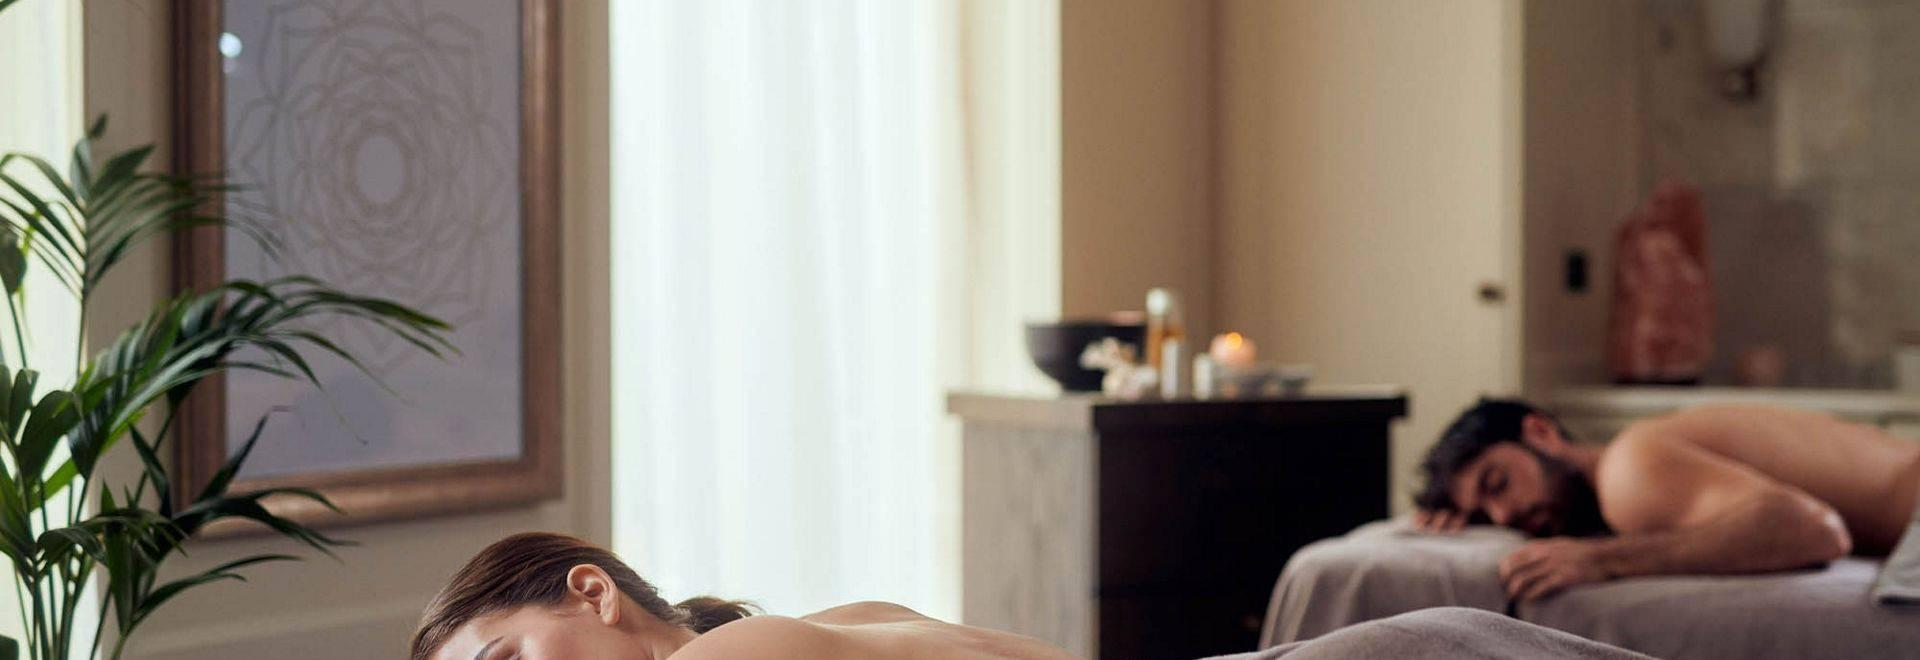 Grantley_Hall_Couples_Treatment_Room.jpg